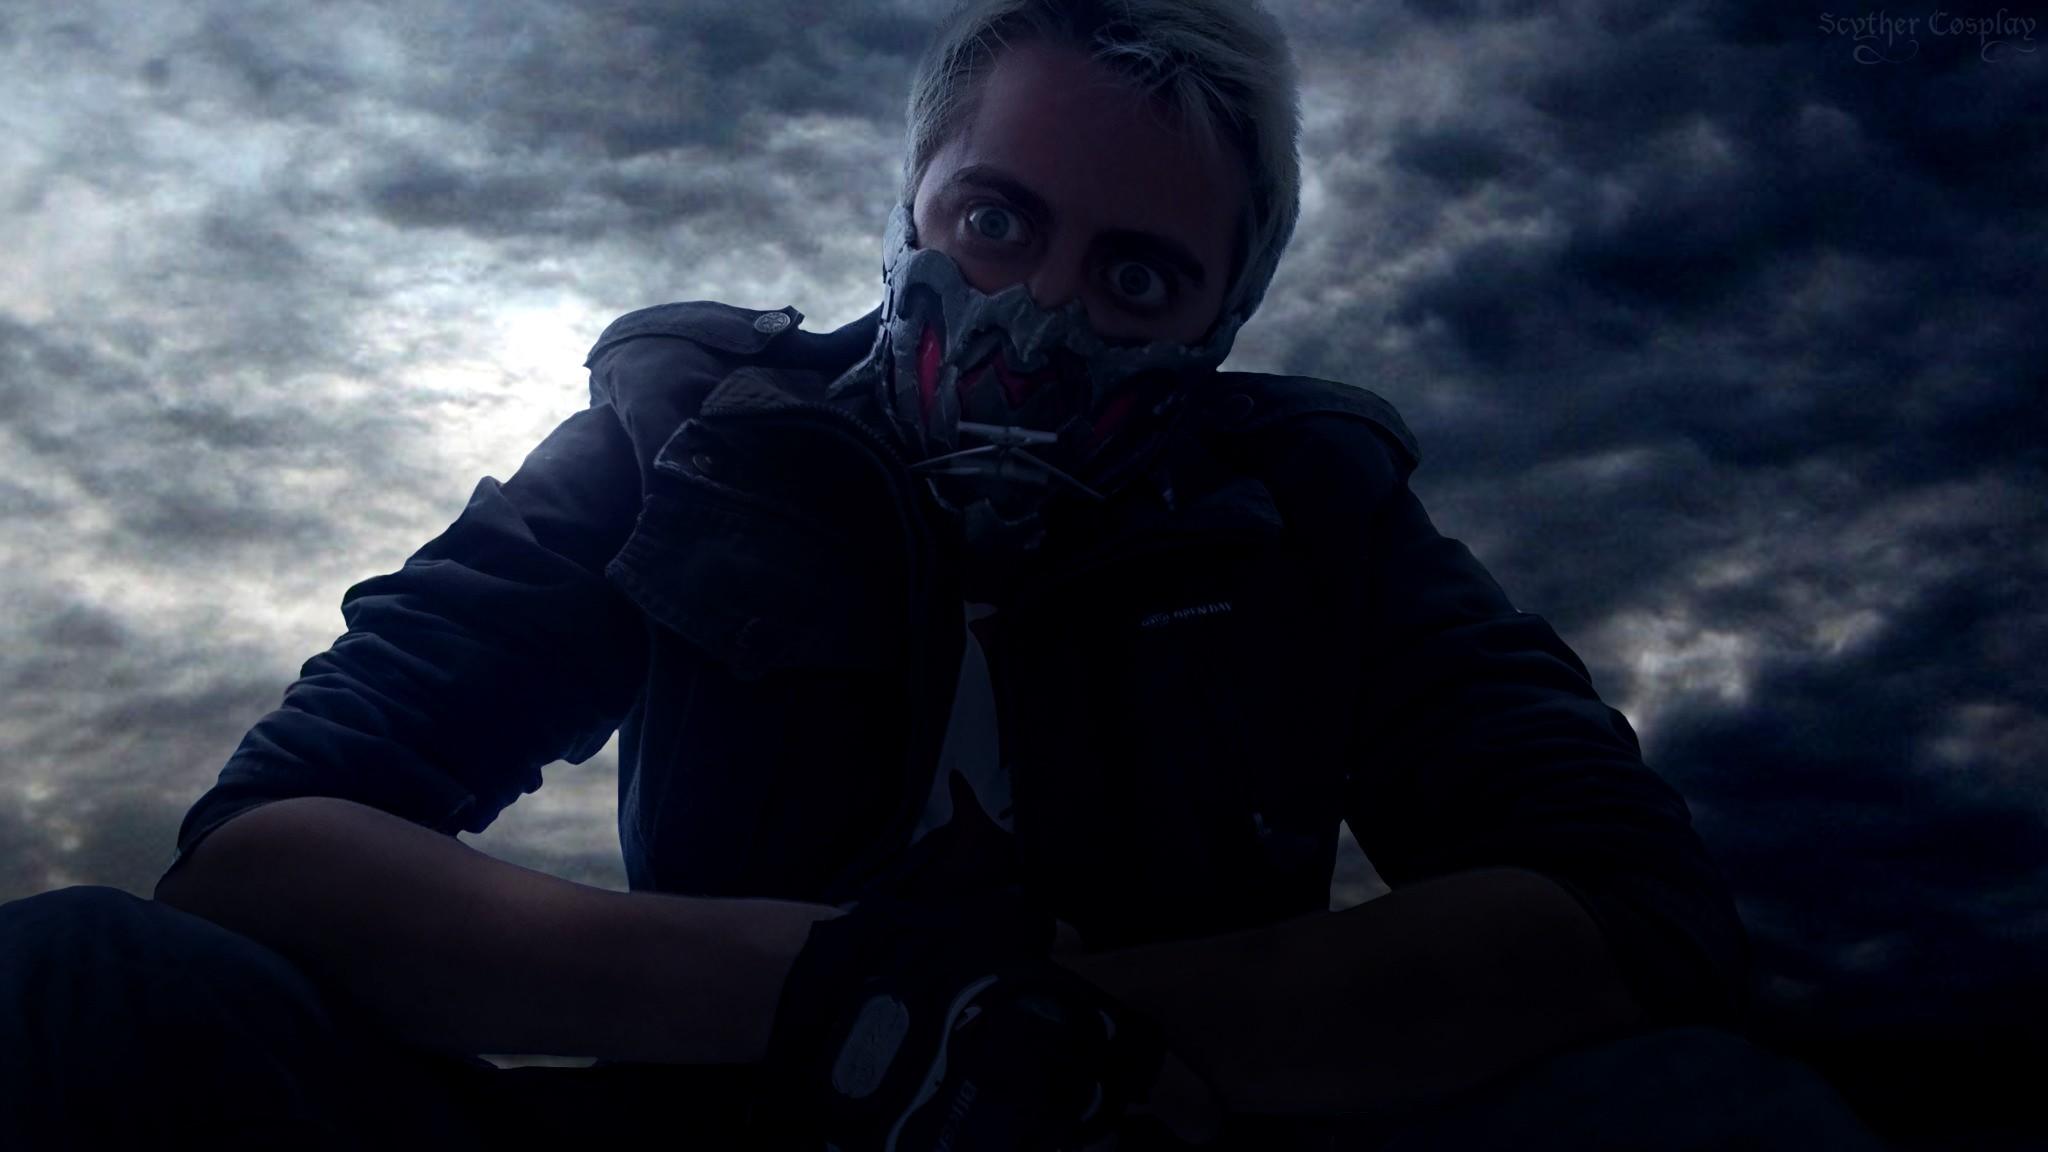 General 2048x1152 apocalyptic mask backlighting photo manipulation